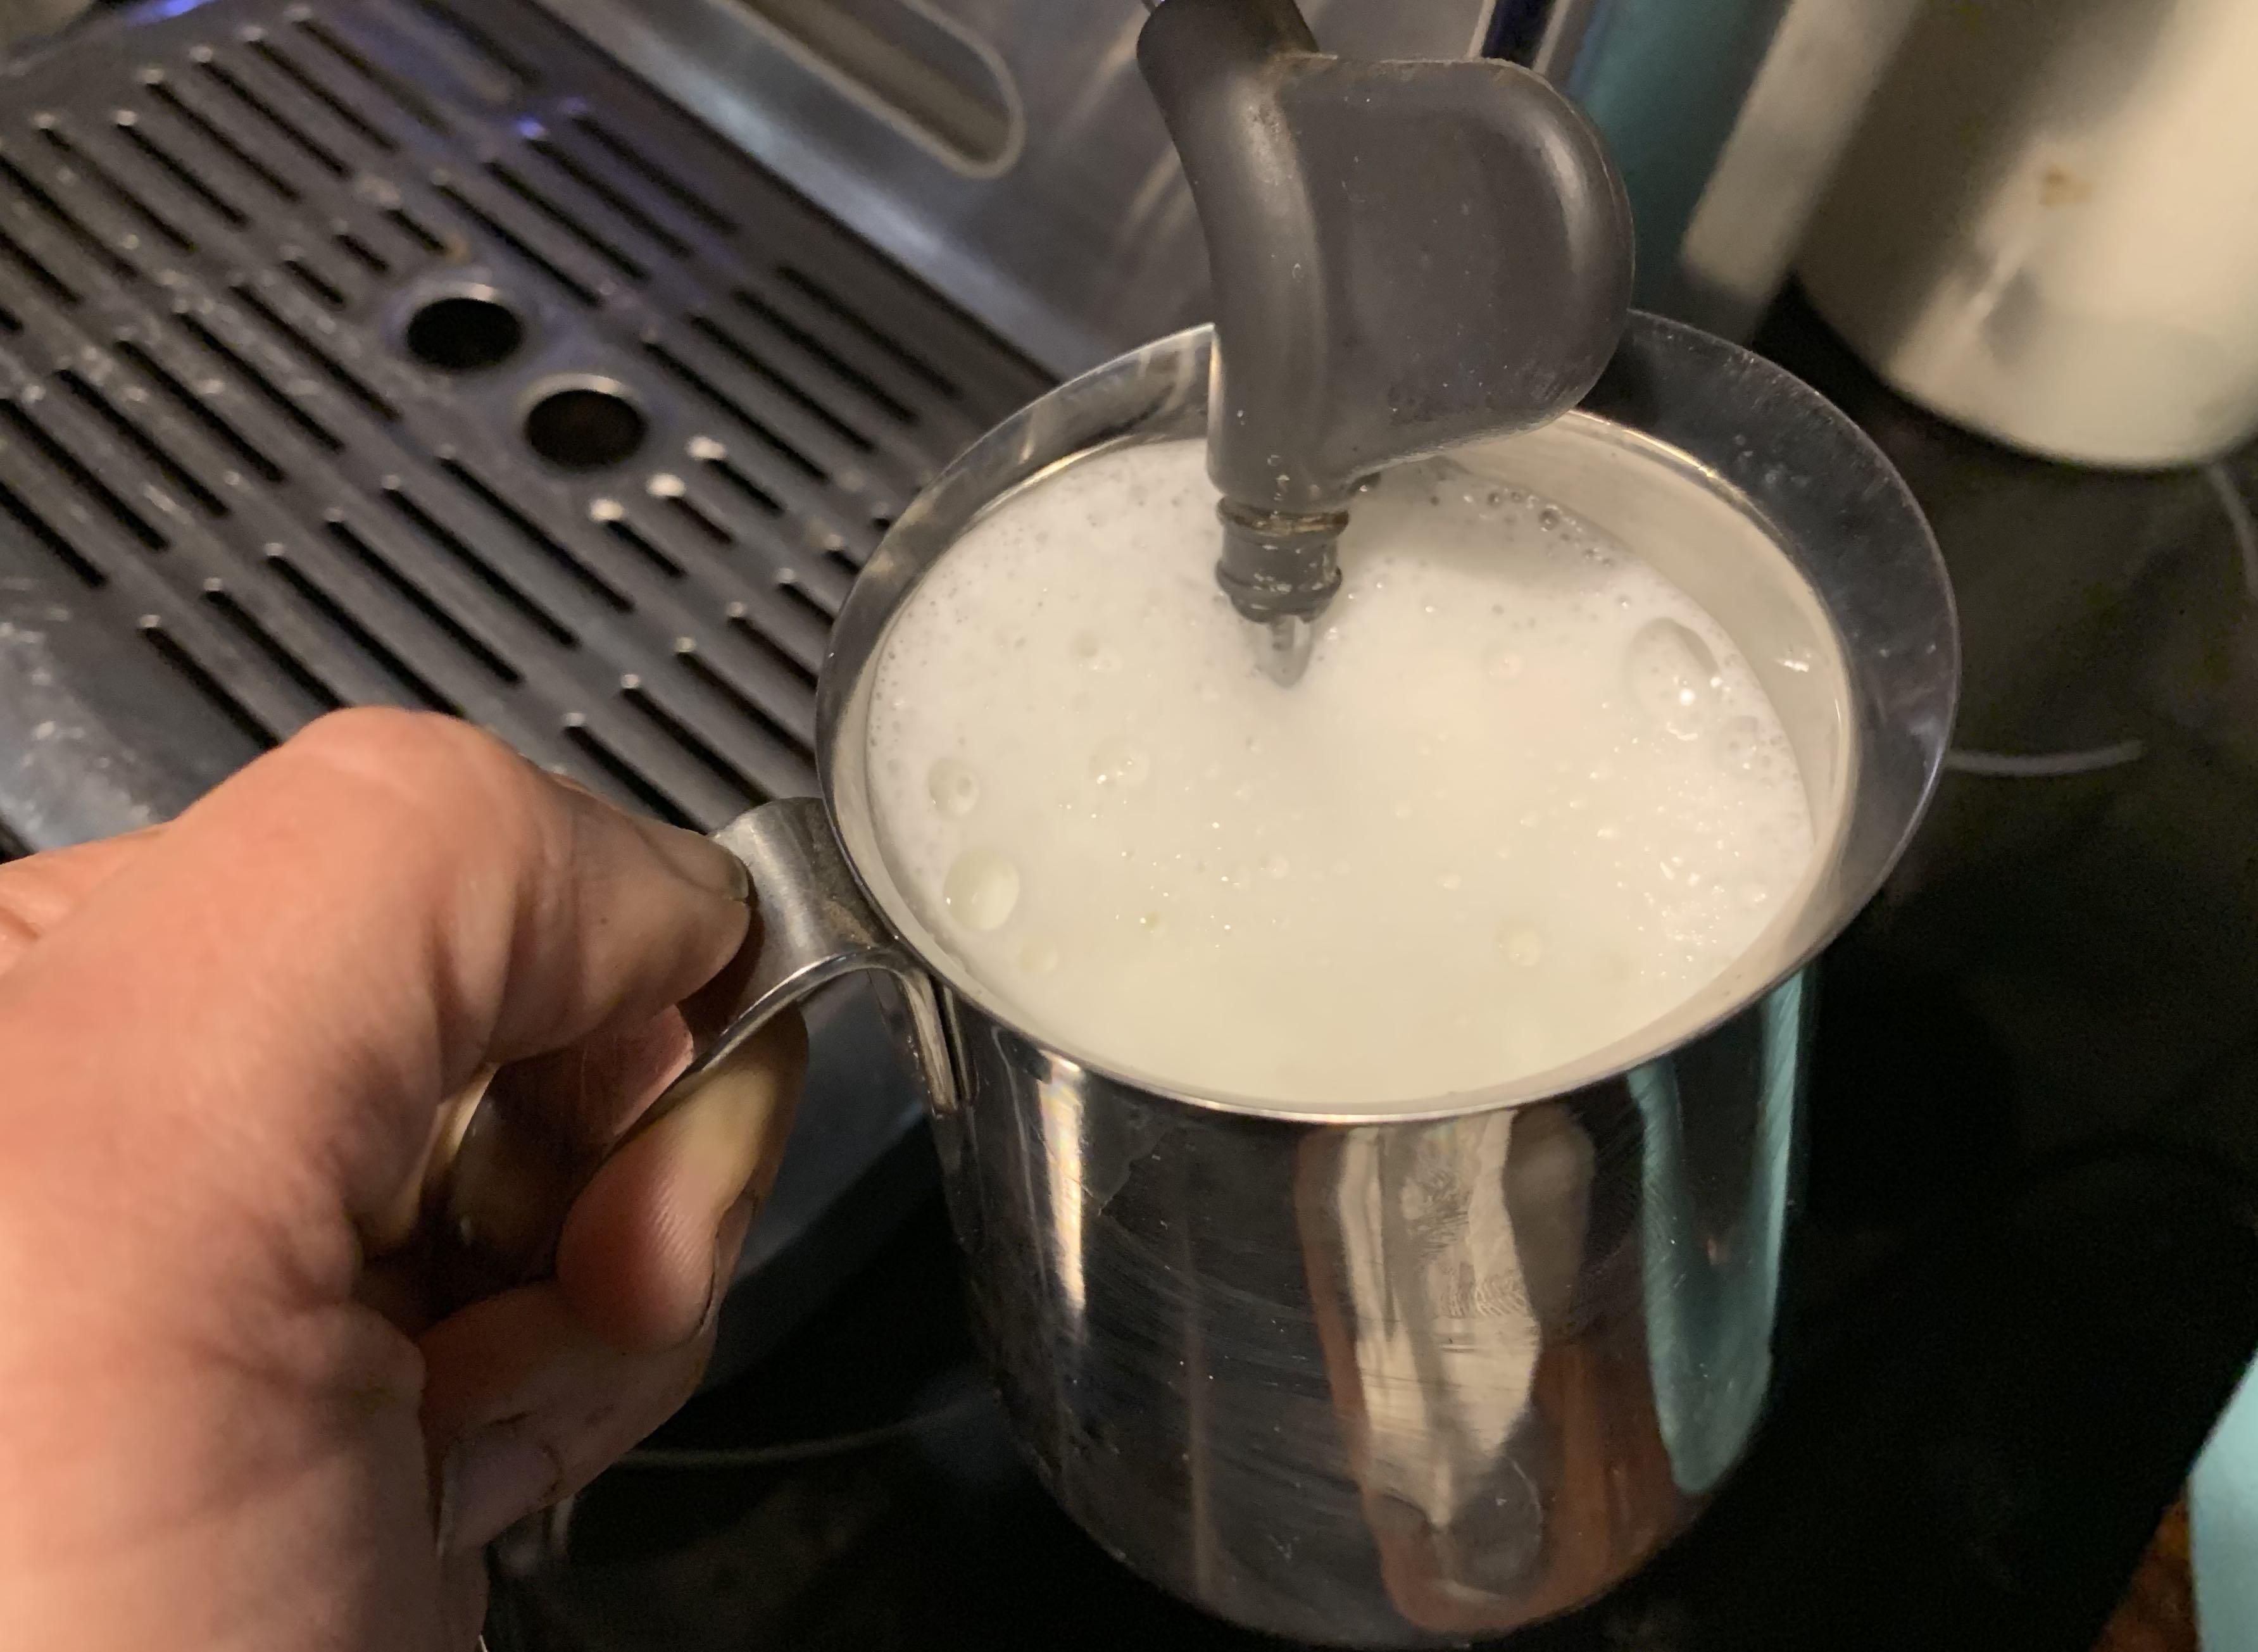 How to foam milk